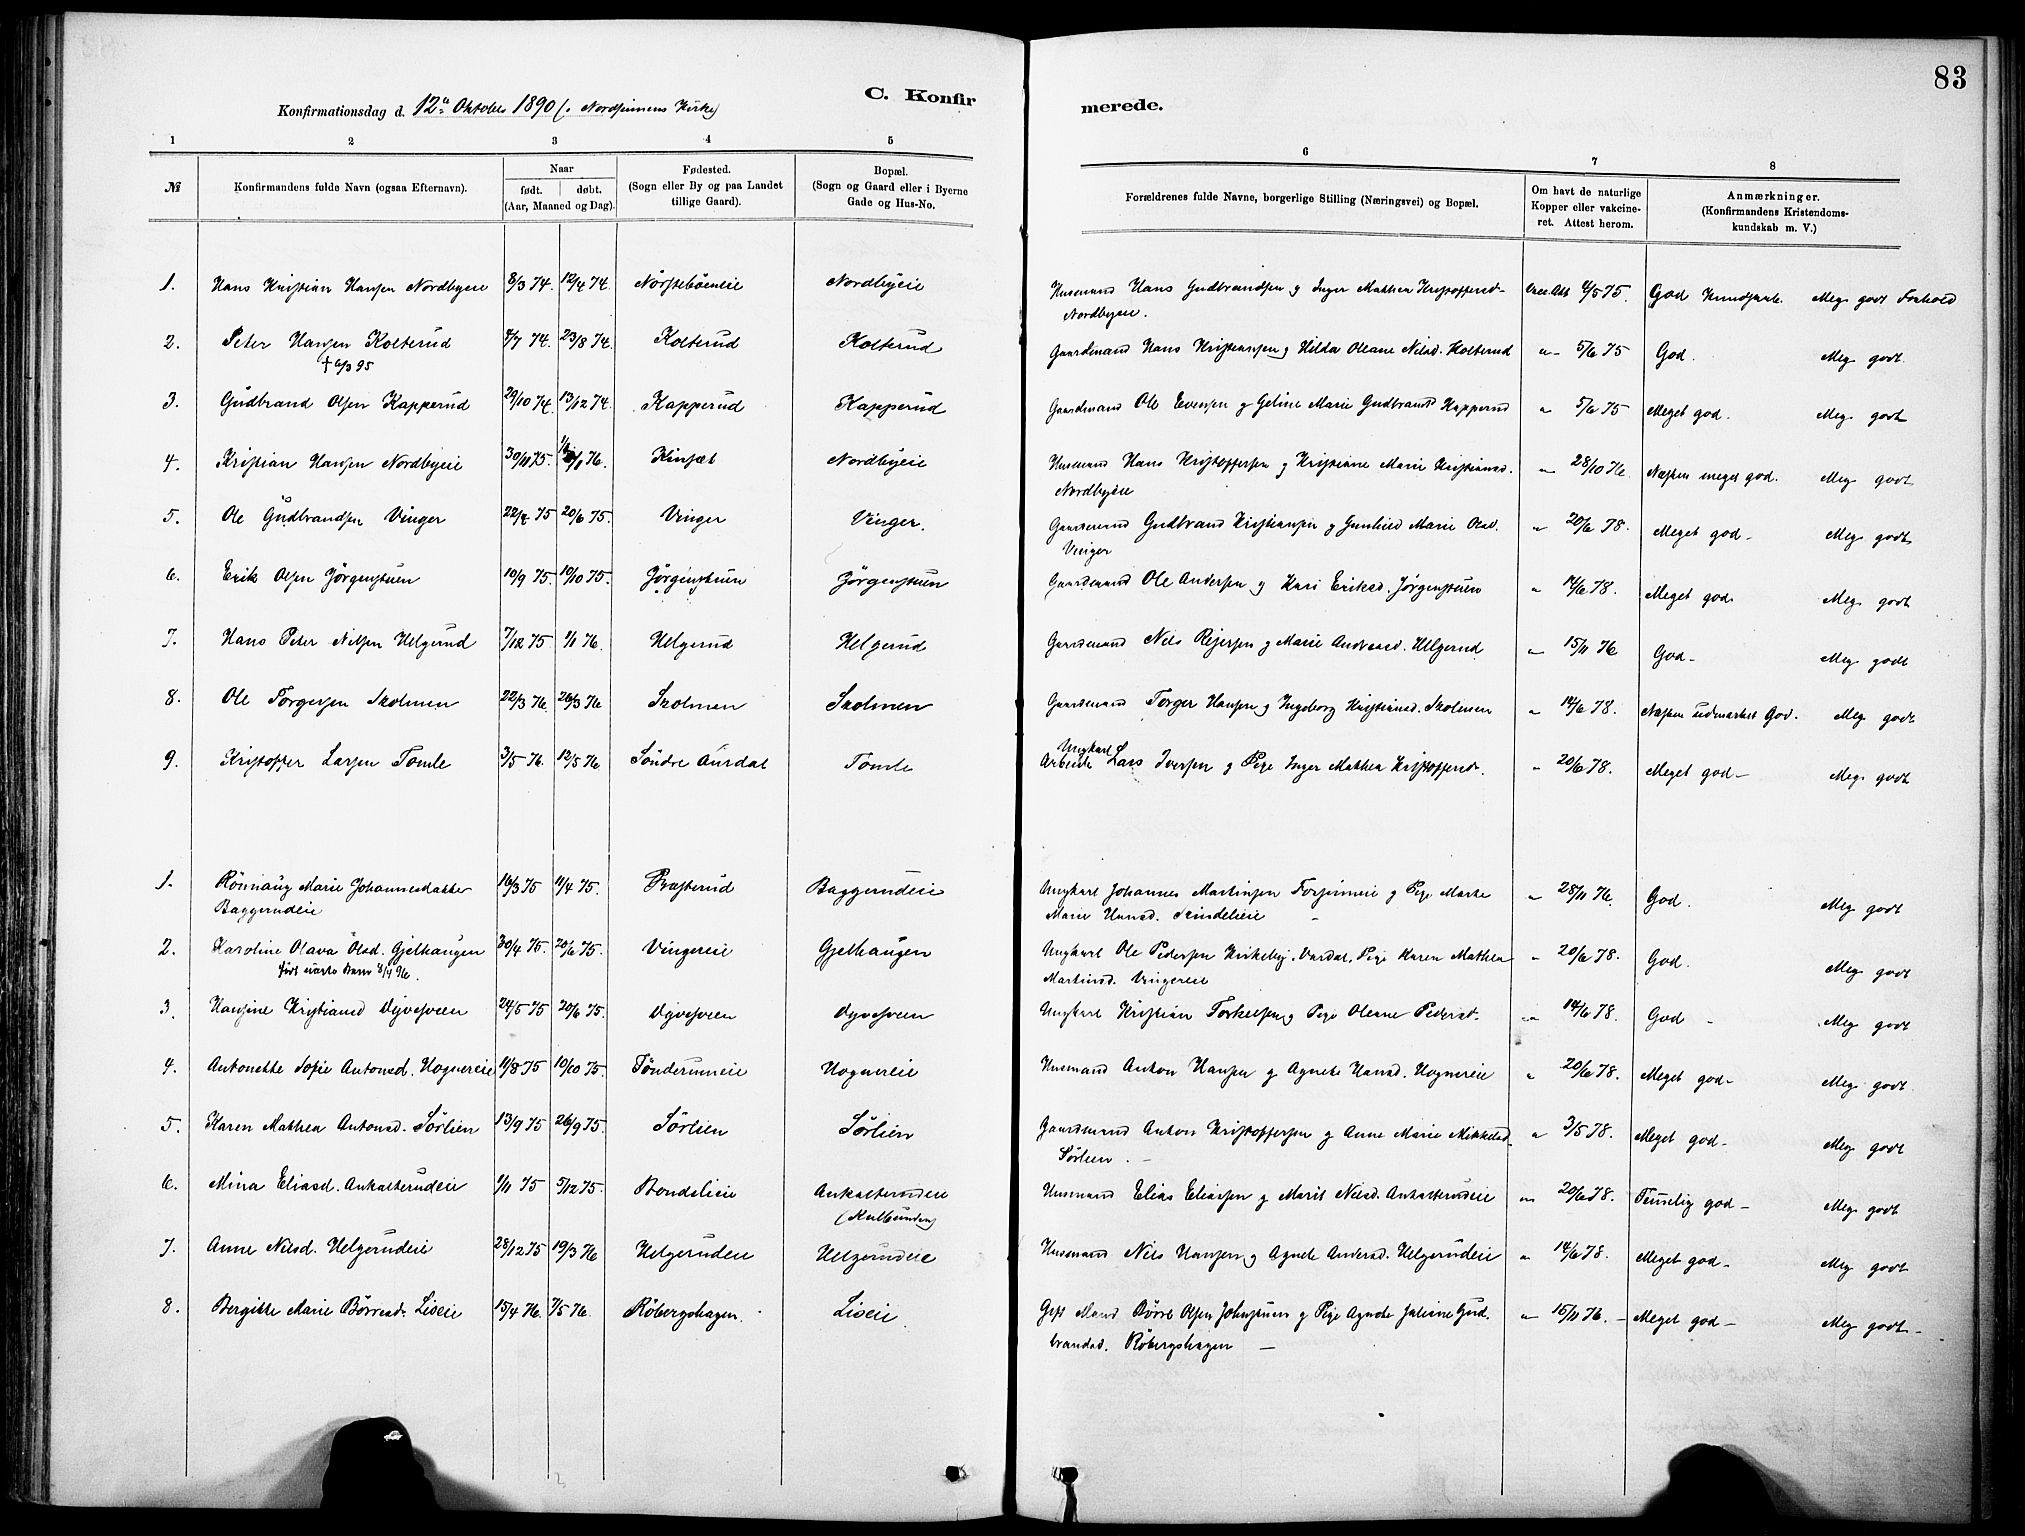 SAH, Nordre Land prestekontor, Ministerialbok nr. 5, 1882-1903, s. 83